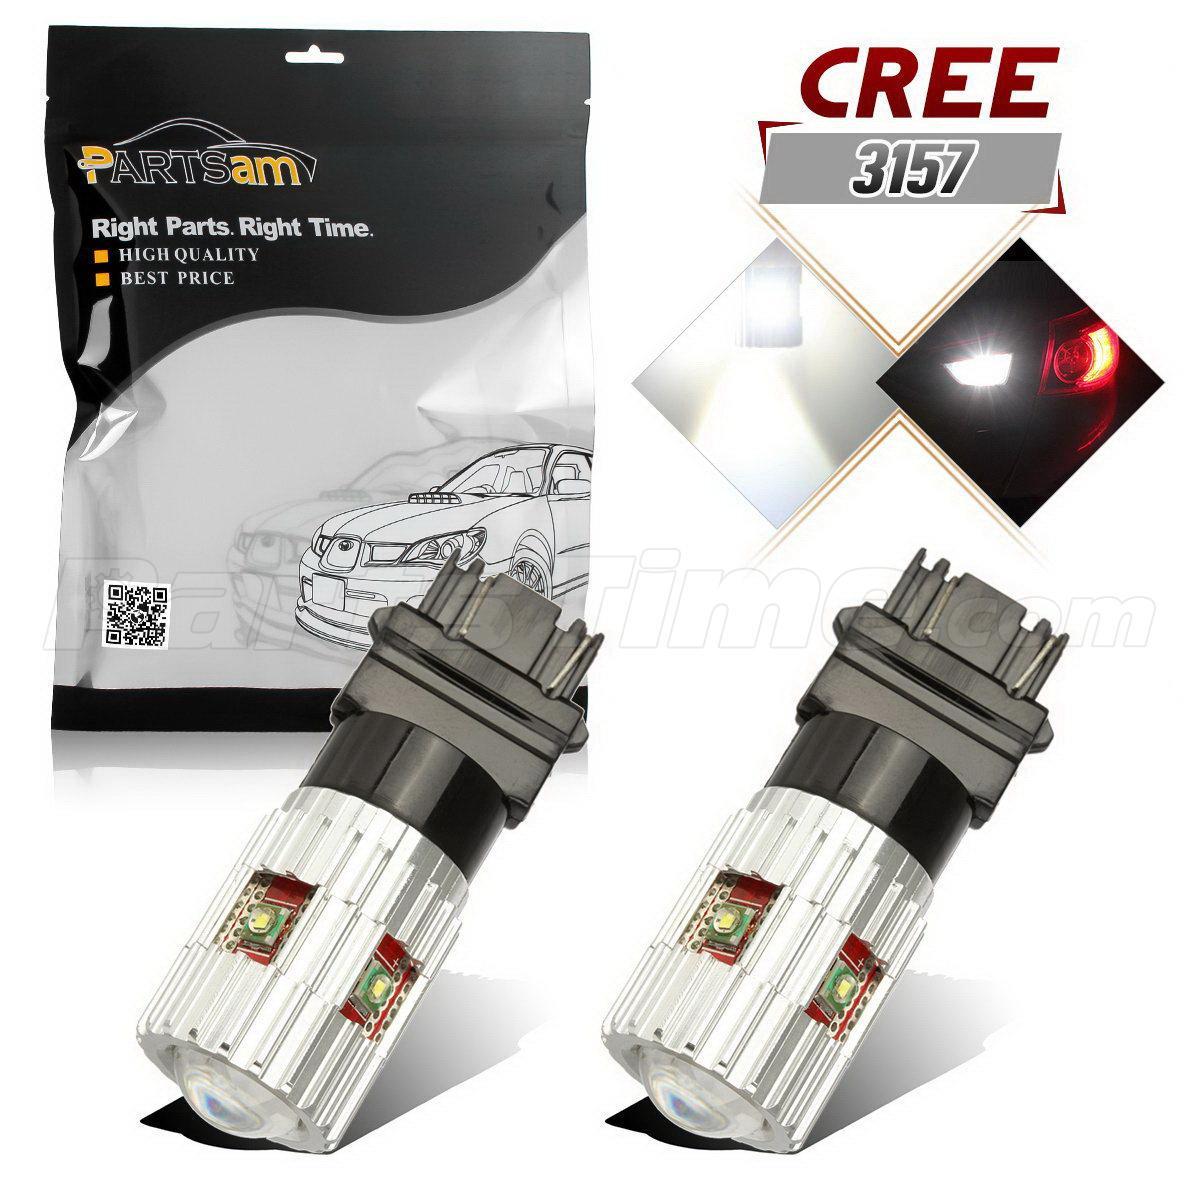 2005 2009 ford mustang 2x hid white 921 led reverse light bulb backup - 2x 4057 White High Power 25w Cree Led 3157 T25 For Backup Reverse Light Bulbs